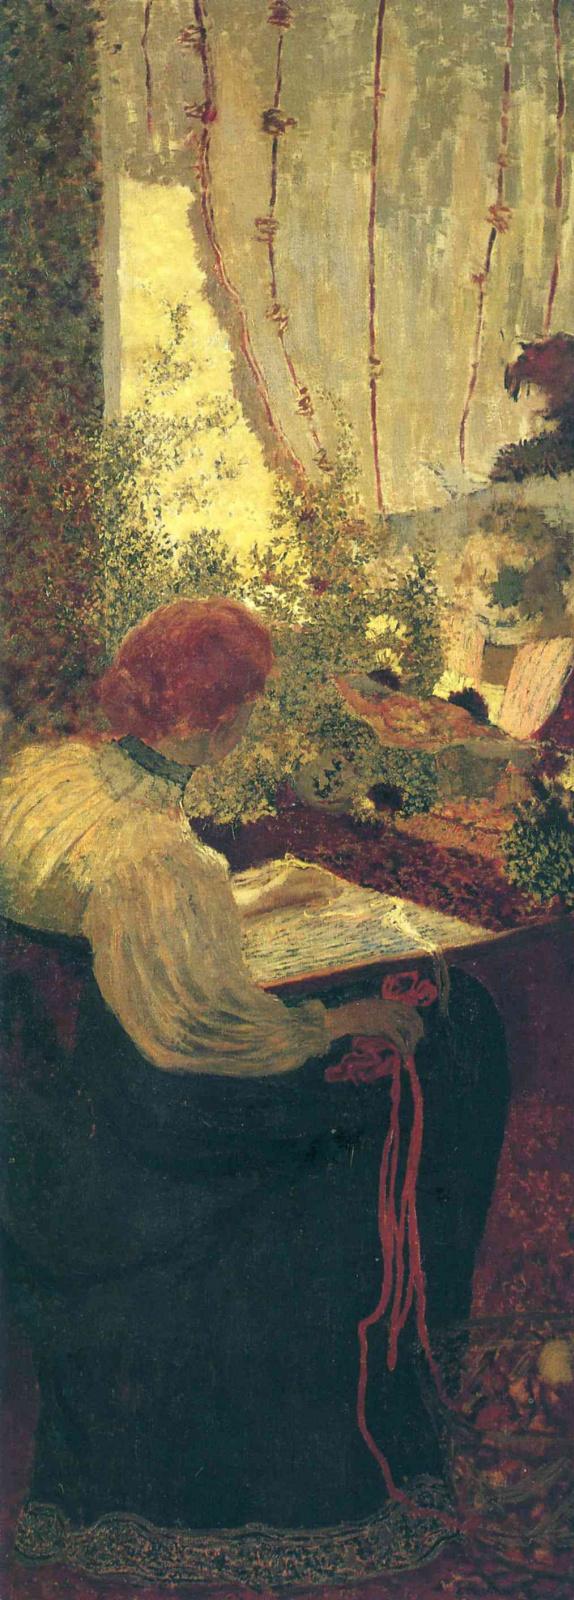 Jean Edouard Vuillard. Embroidery